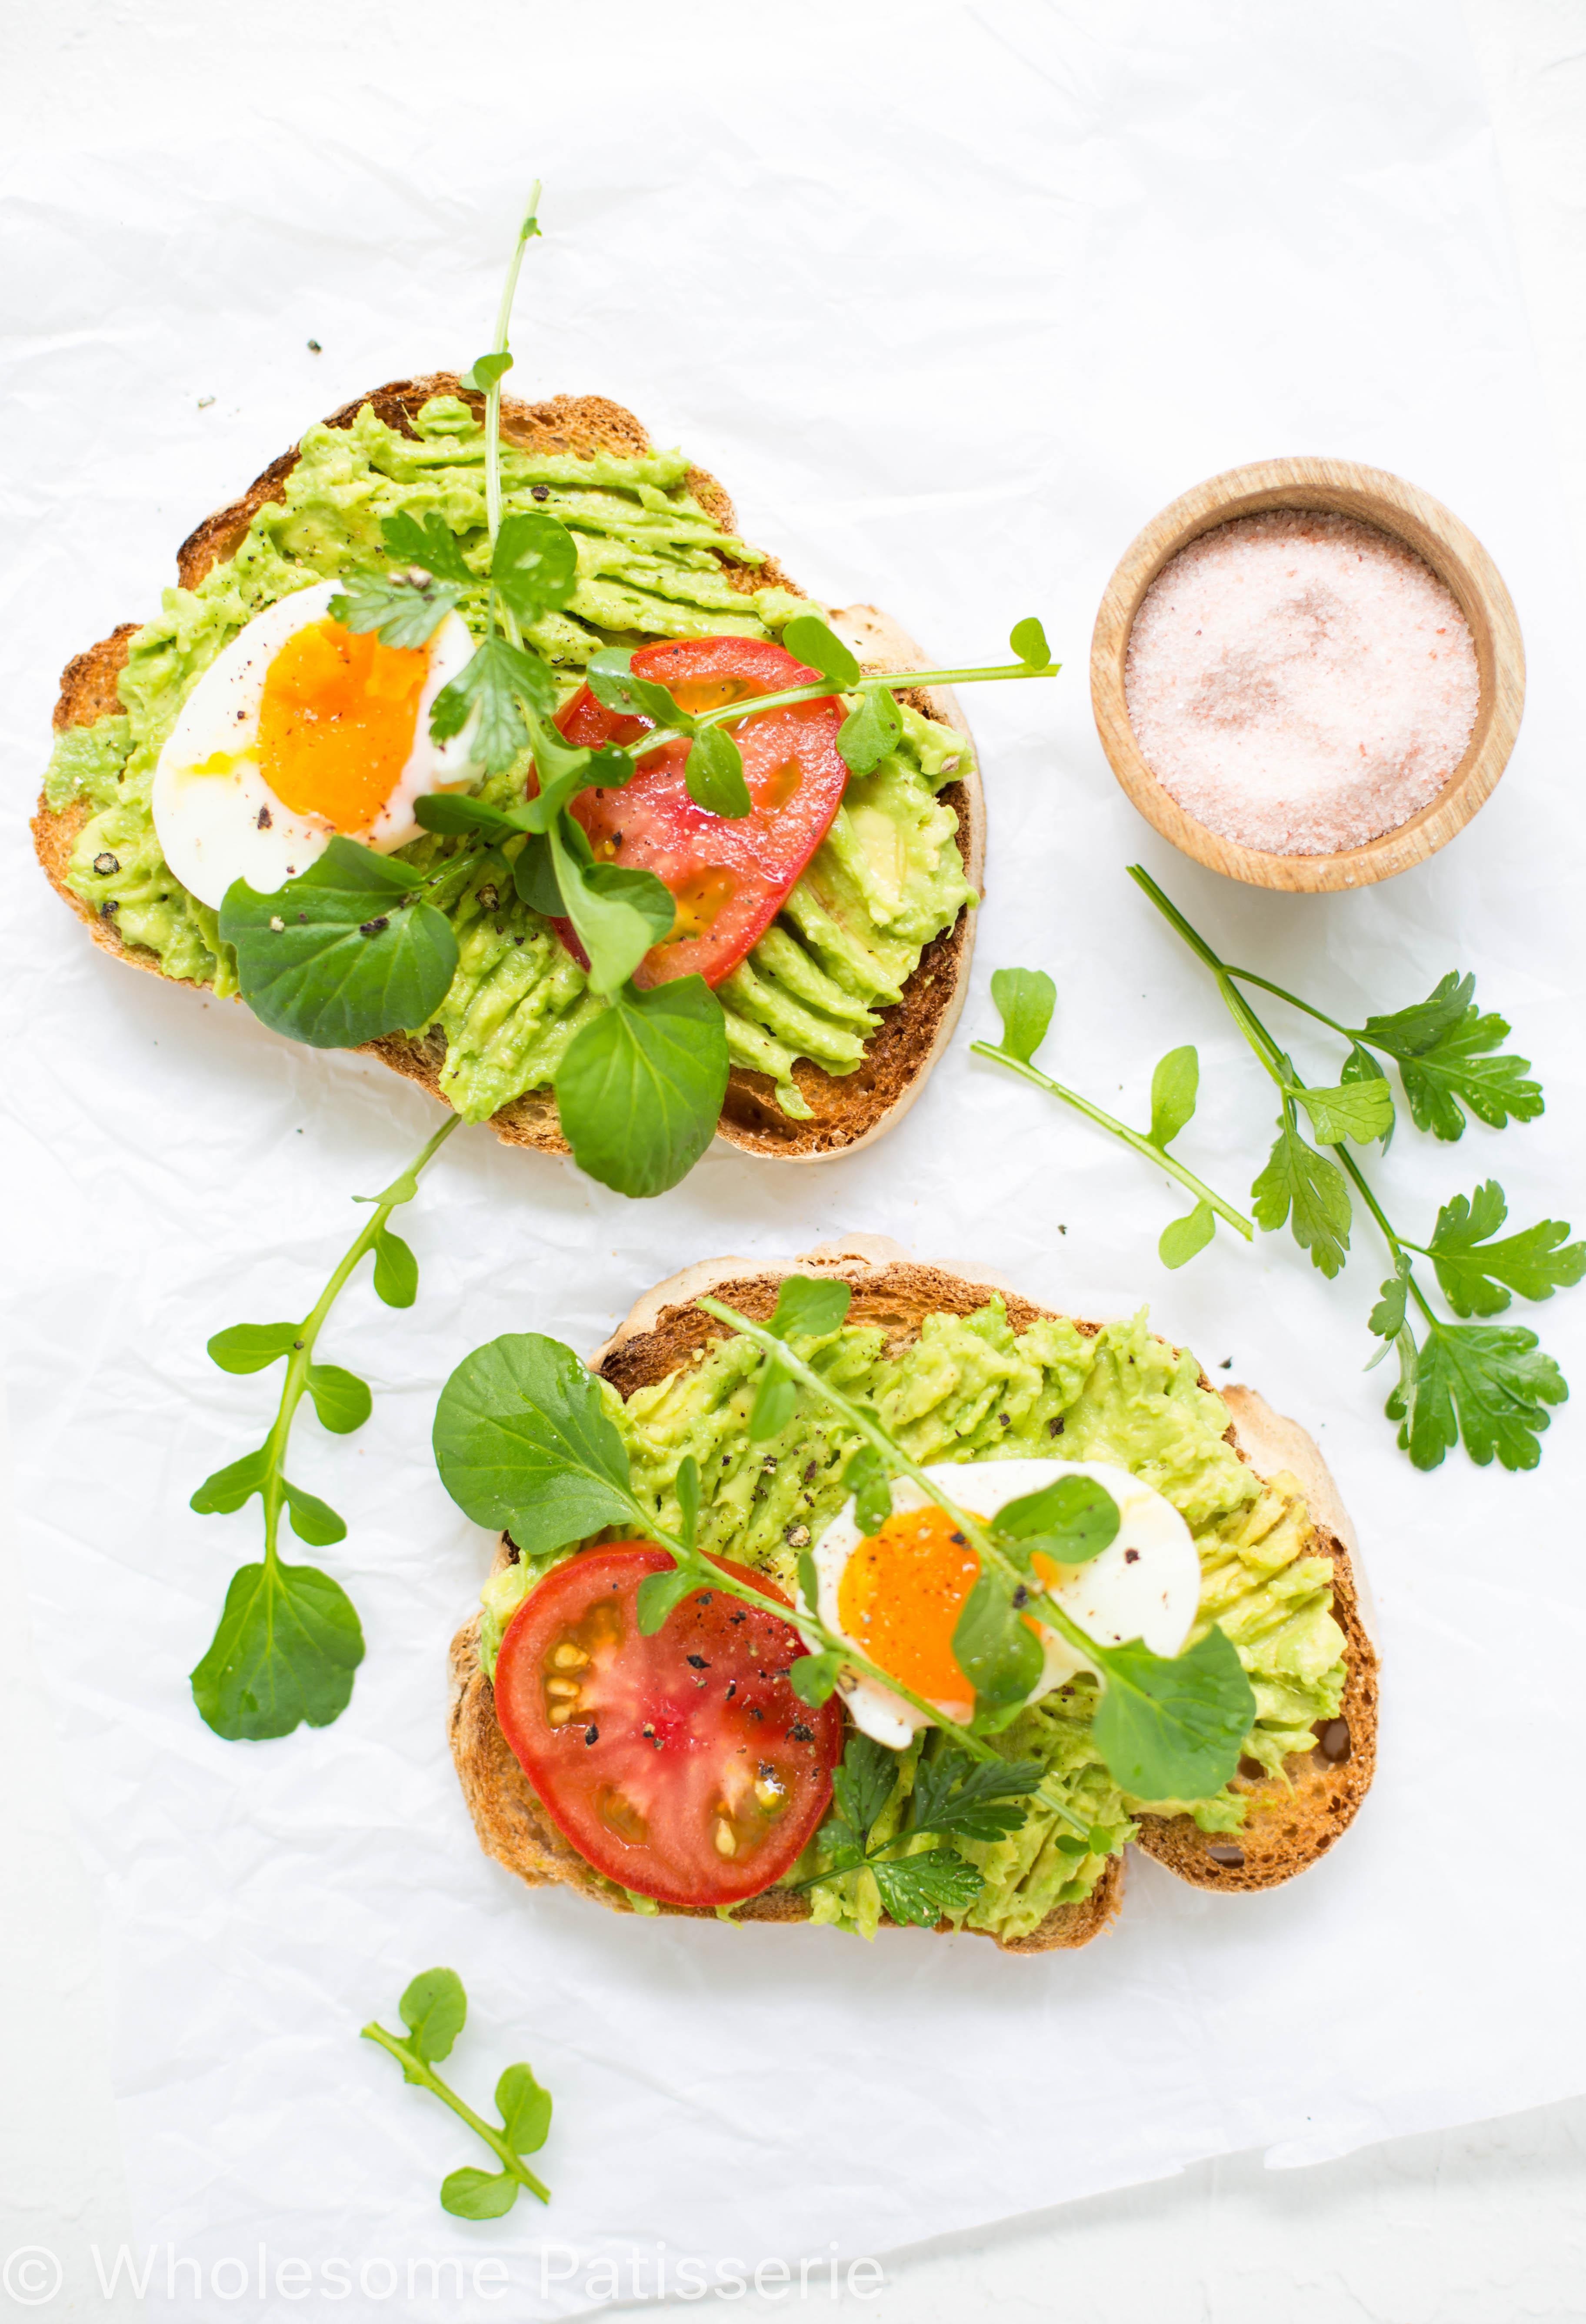 smashed-avocado-toast-healthy-breakfast-gluten-free-boiled-eggs-tomato-veget